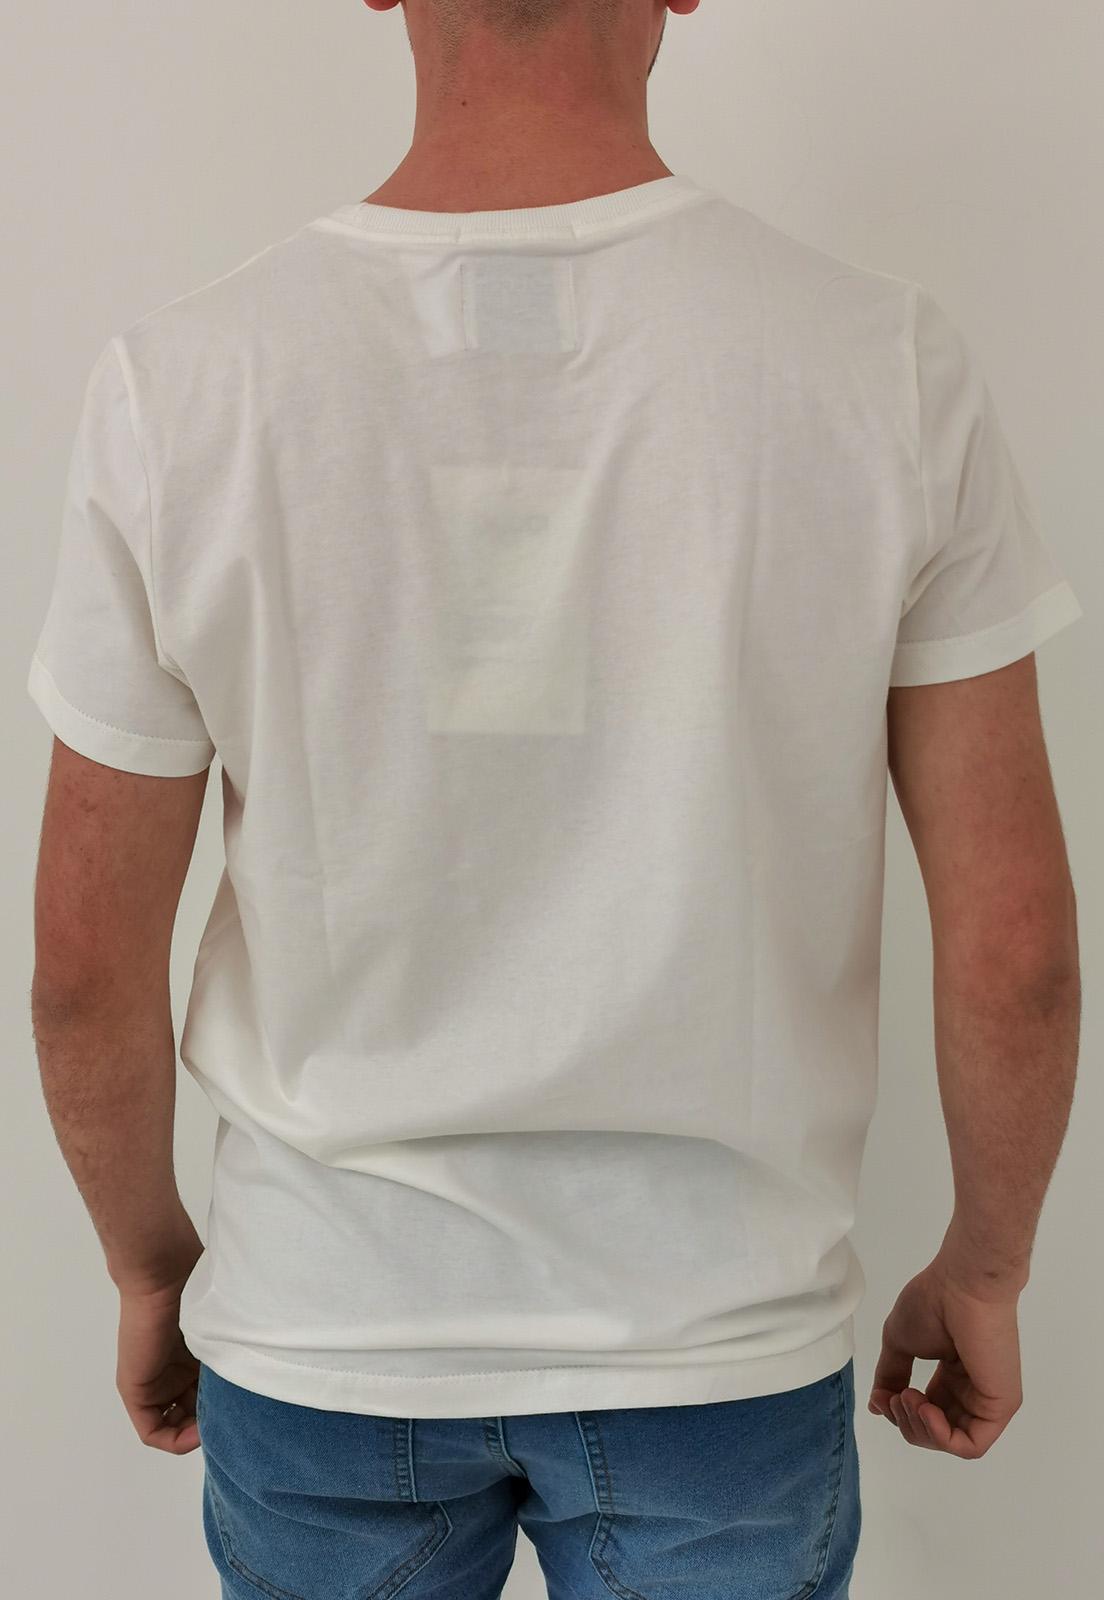 Camiseta Colcci Off White Something